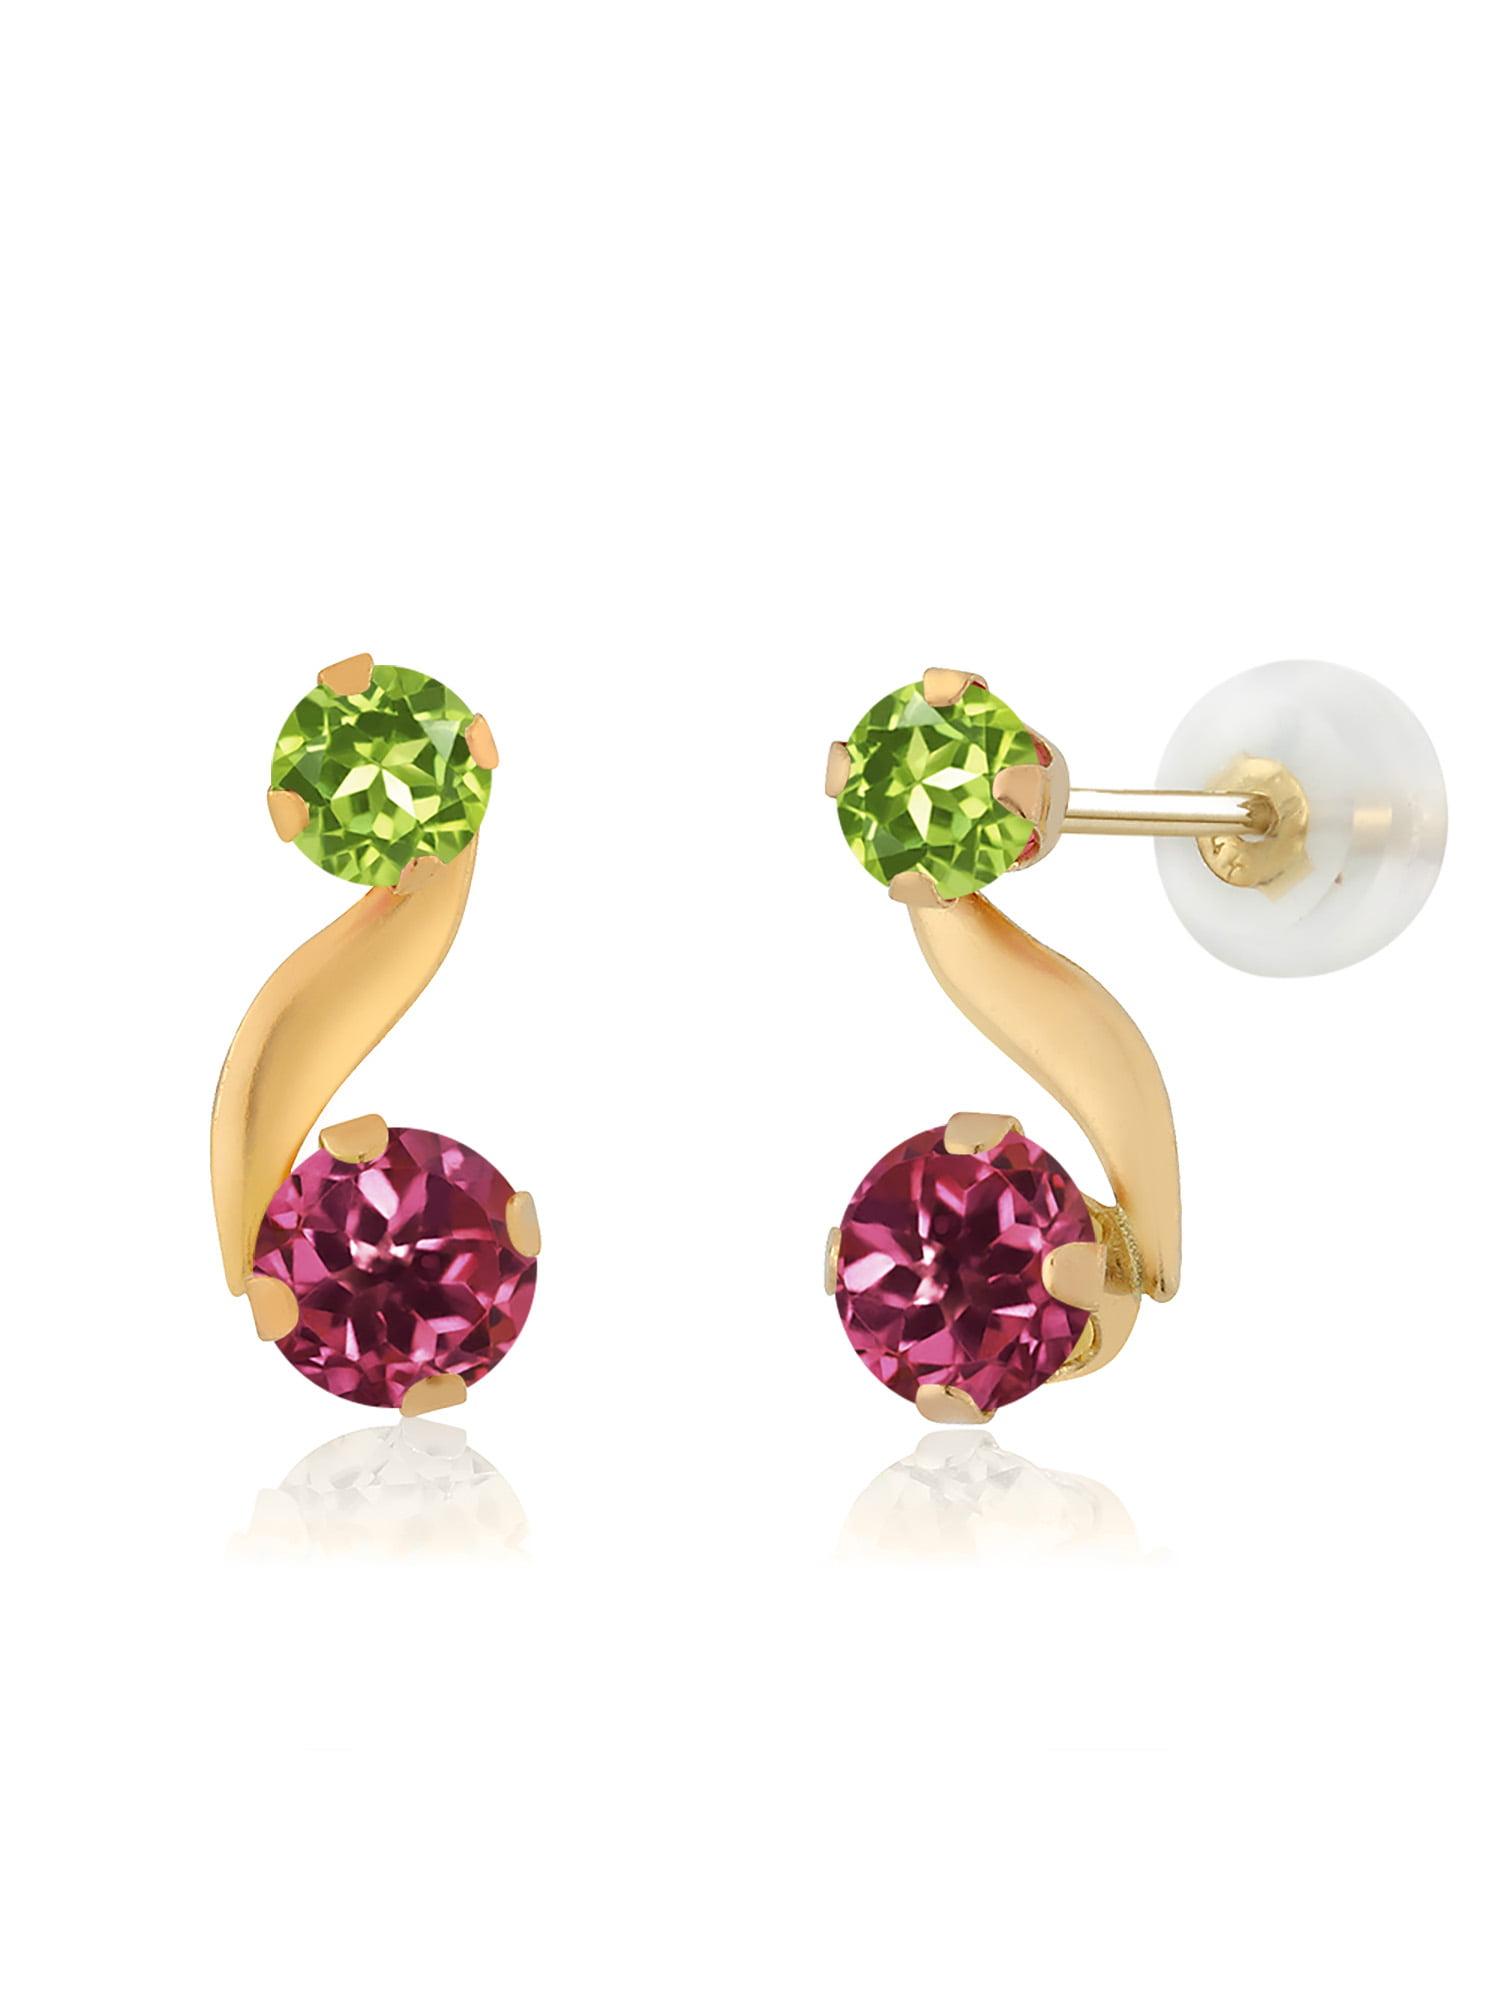 0.72 Ct Round Pink Tourmaline Green Peridot 14K Yellow Gold Earrings by